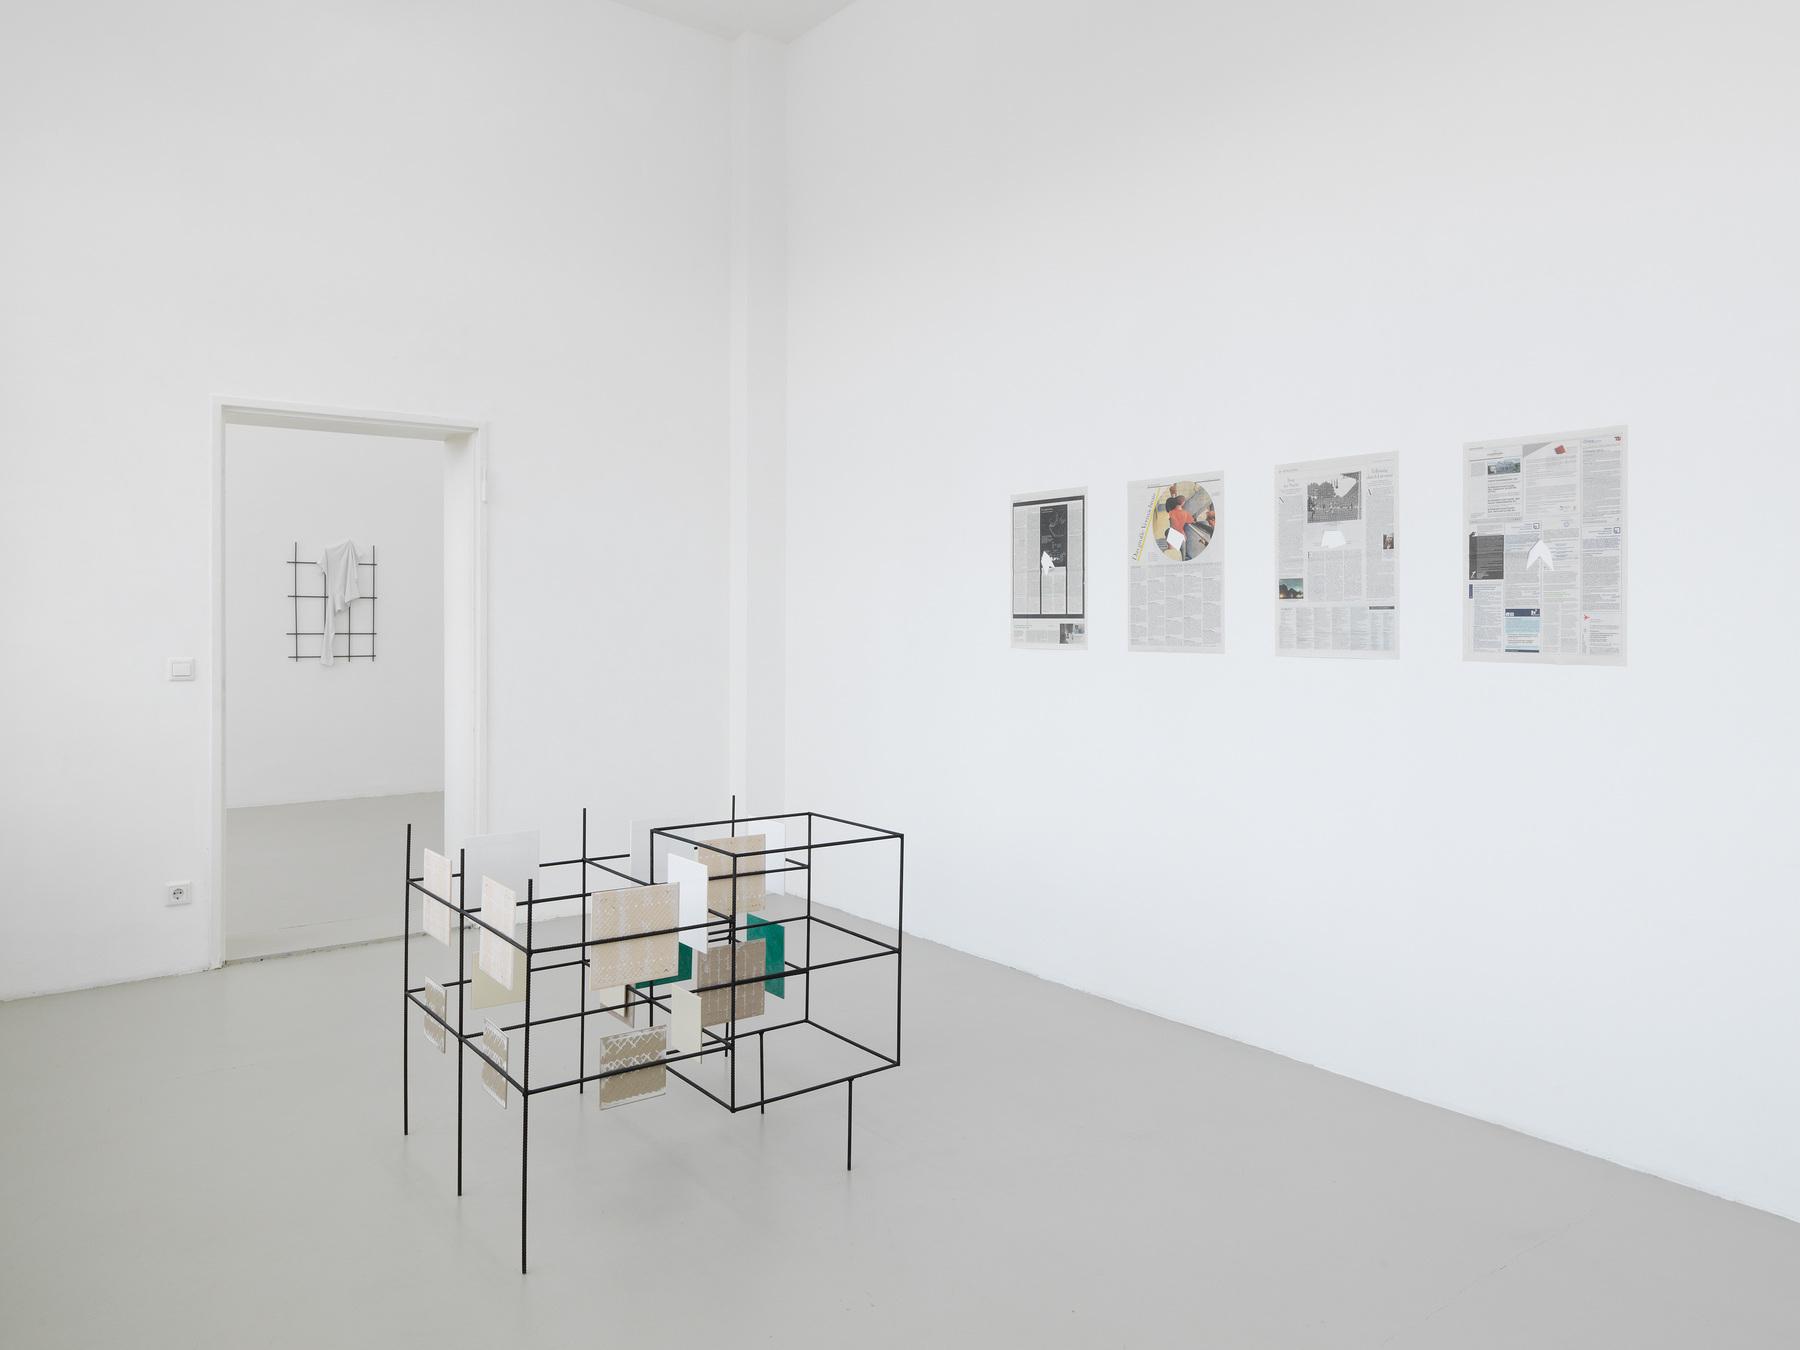 18_Edit Oderbolz_Kunstverein Nürnberg_2017